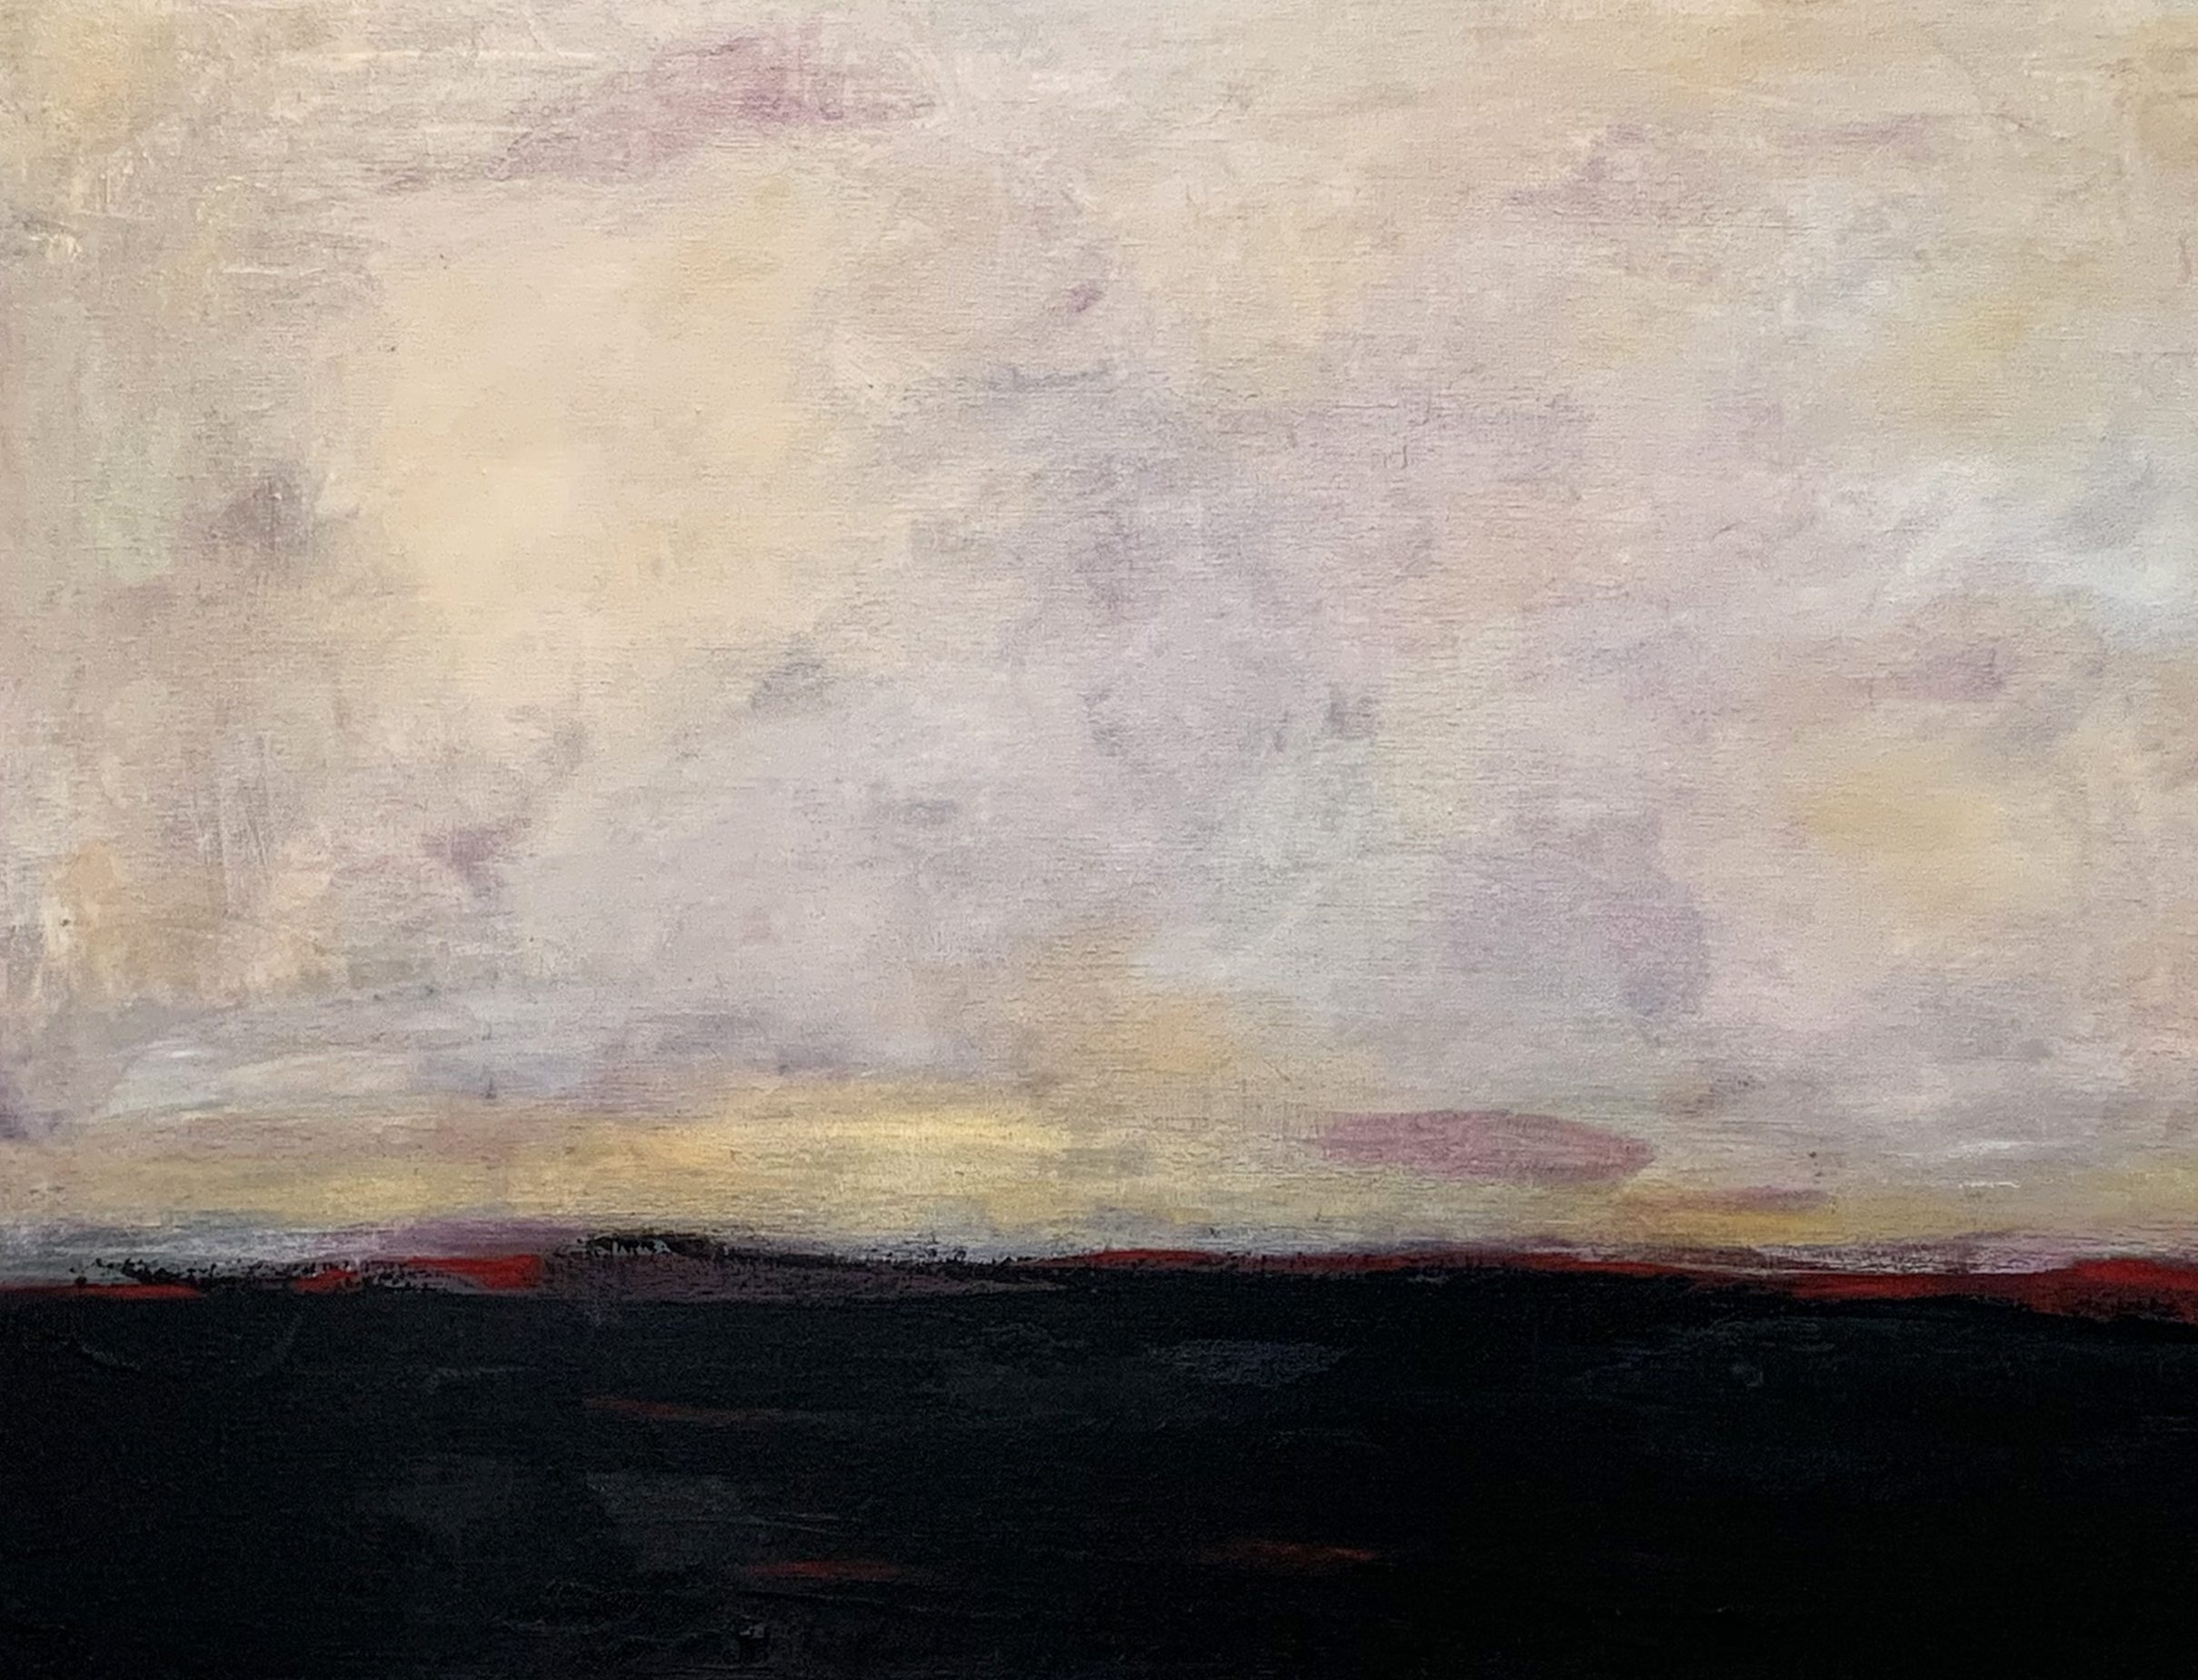 VICTORIA CURLING-ERIKSSON